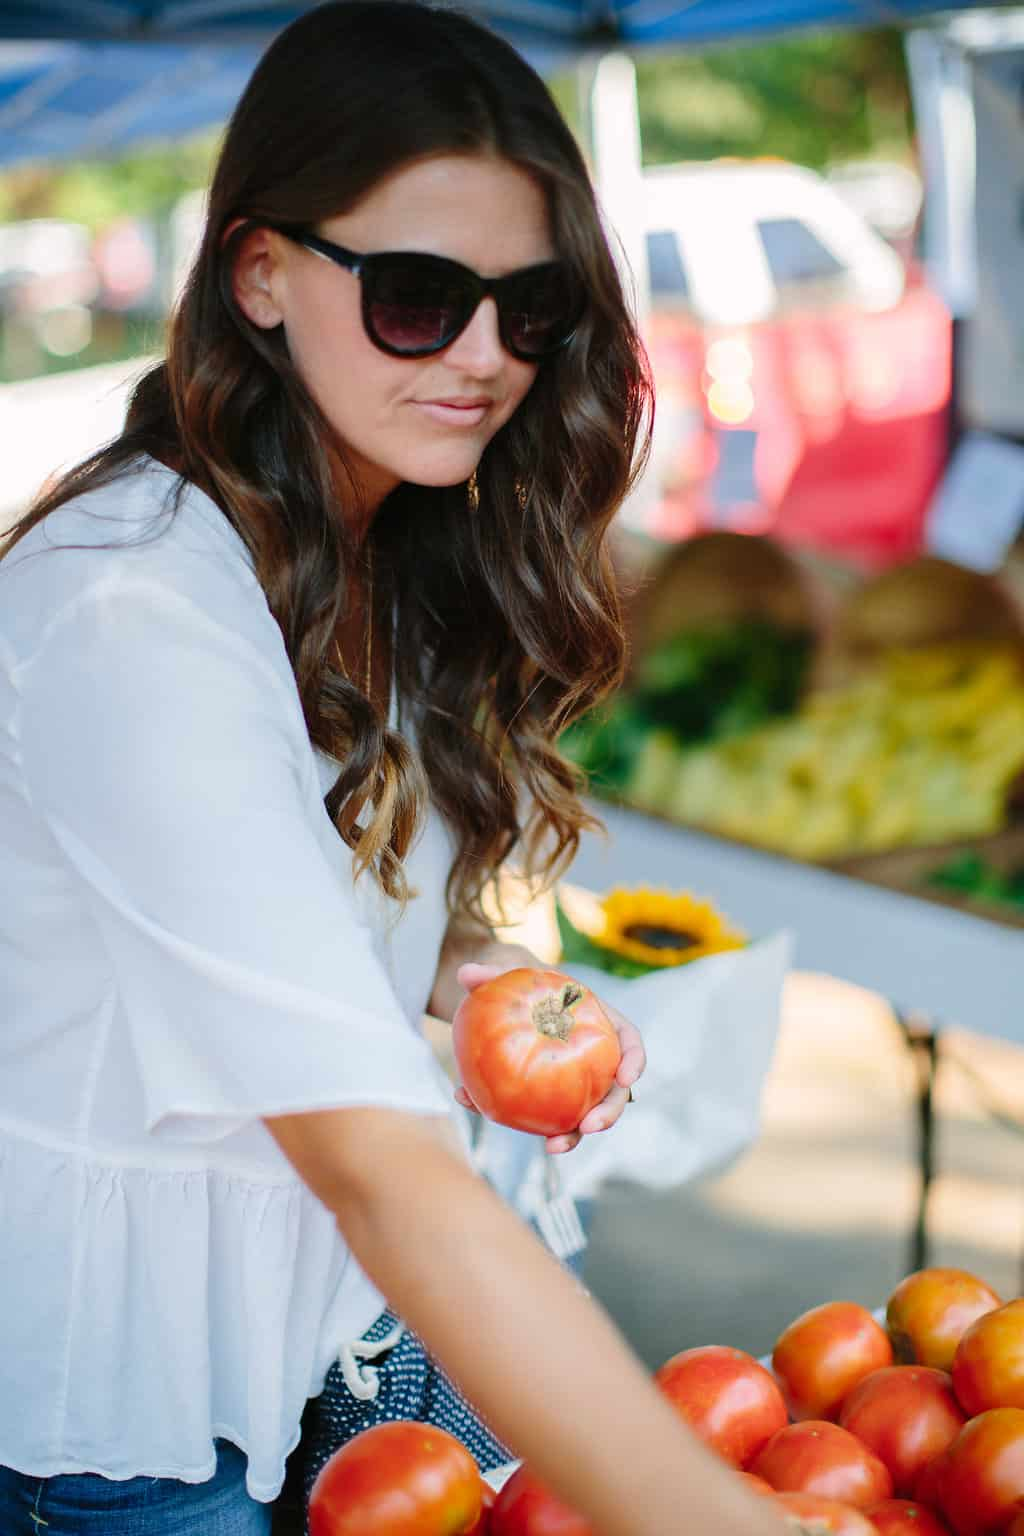 Family-Day-at-the-Davidson-Farmer's-Market-produce